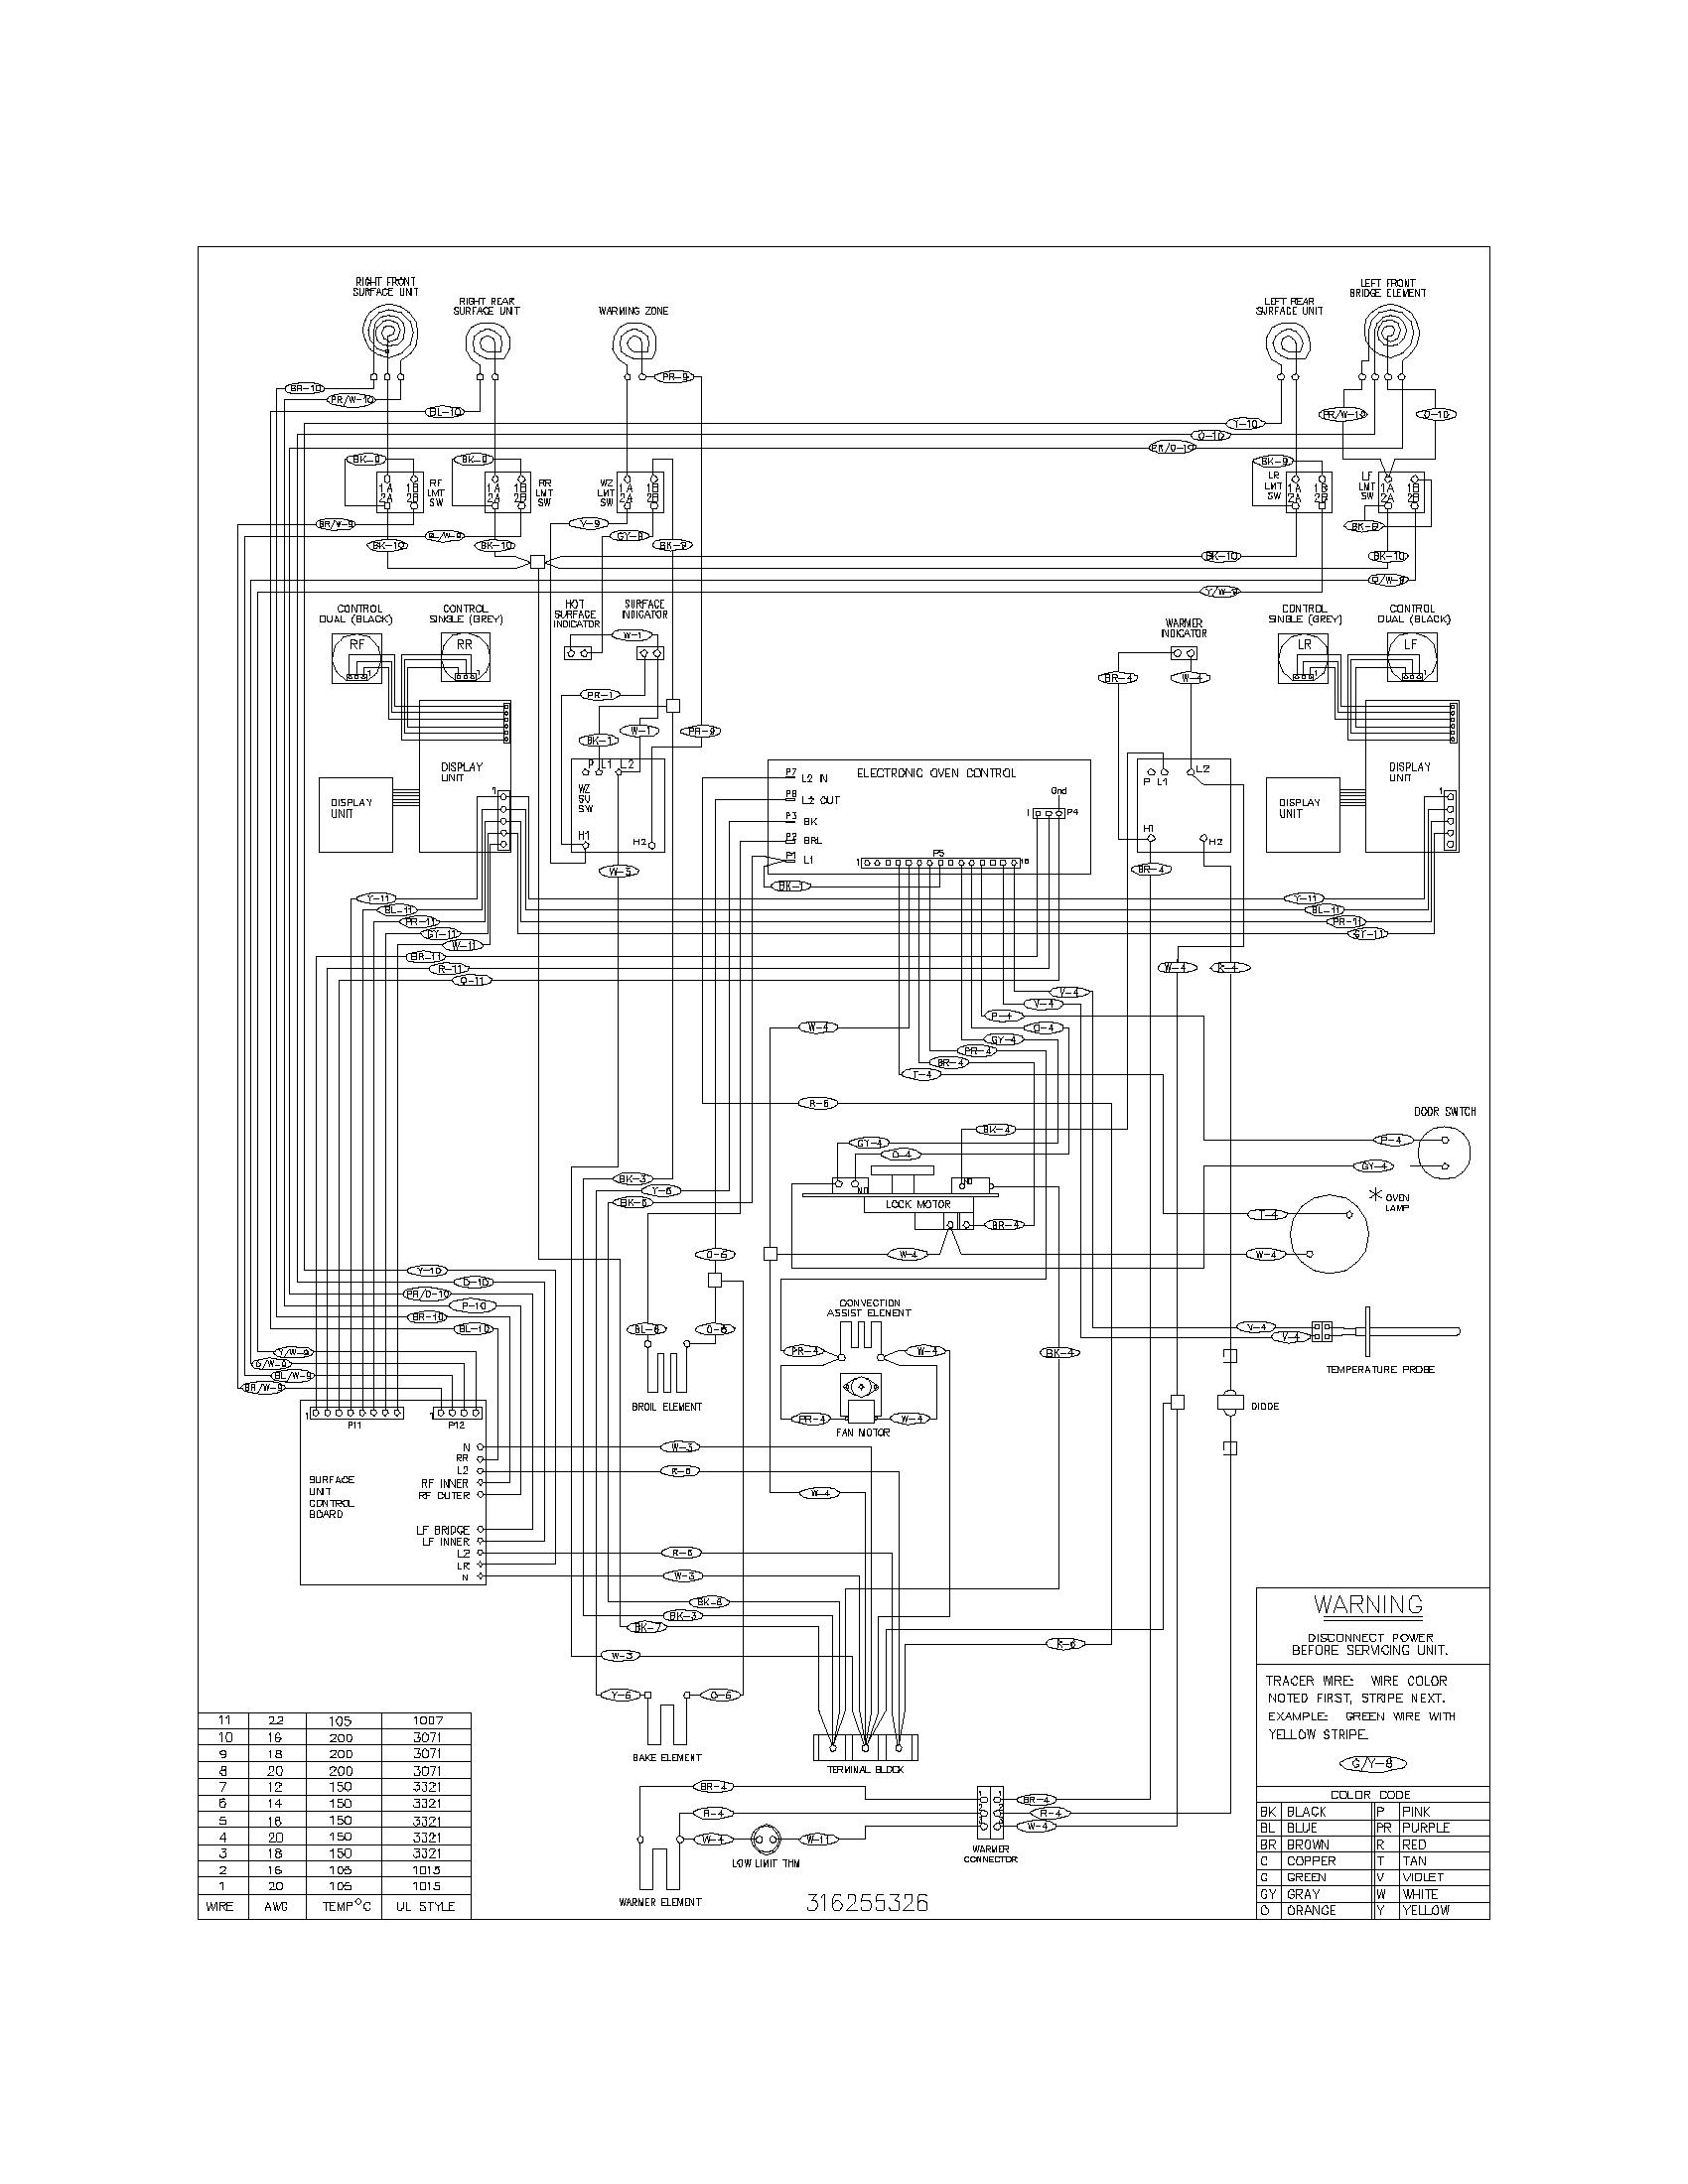 hight resolution of frigidaire plef398ccd electric range timer stove clocks andplef398ccd electric range wiring diagram parts diagram